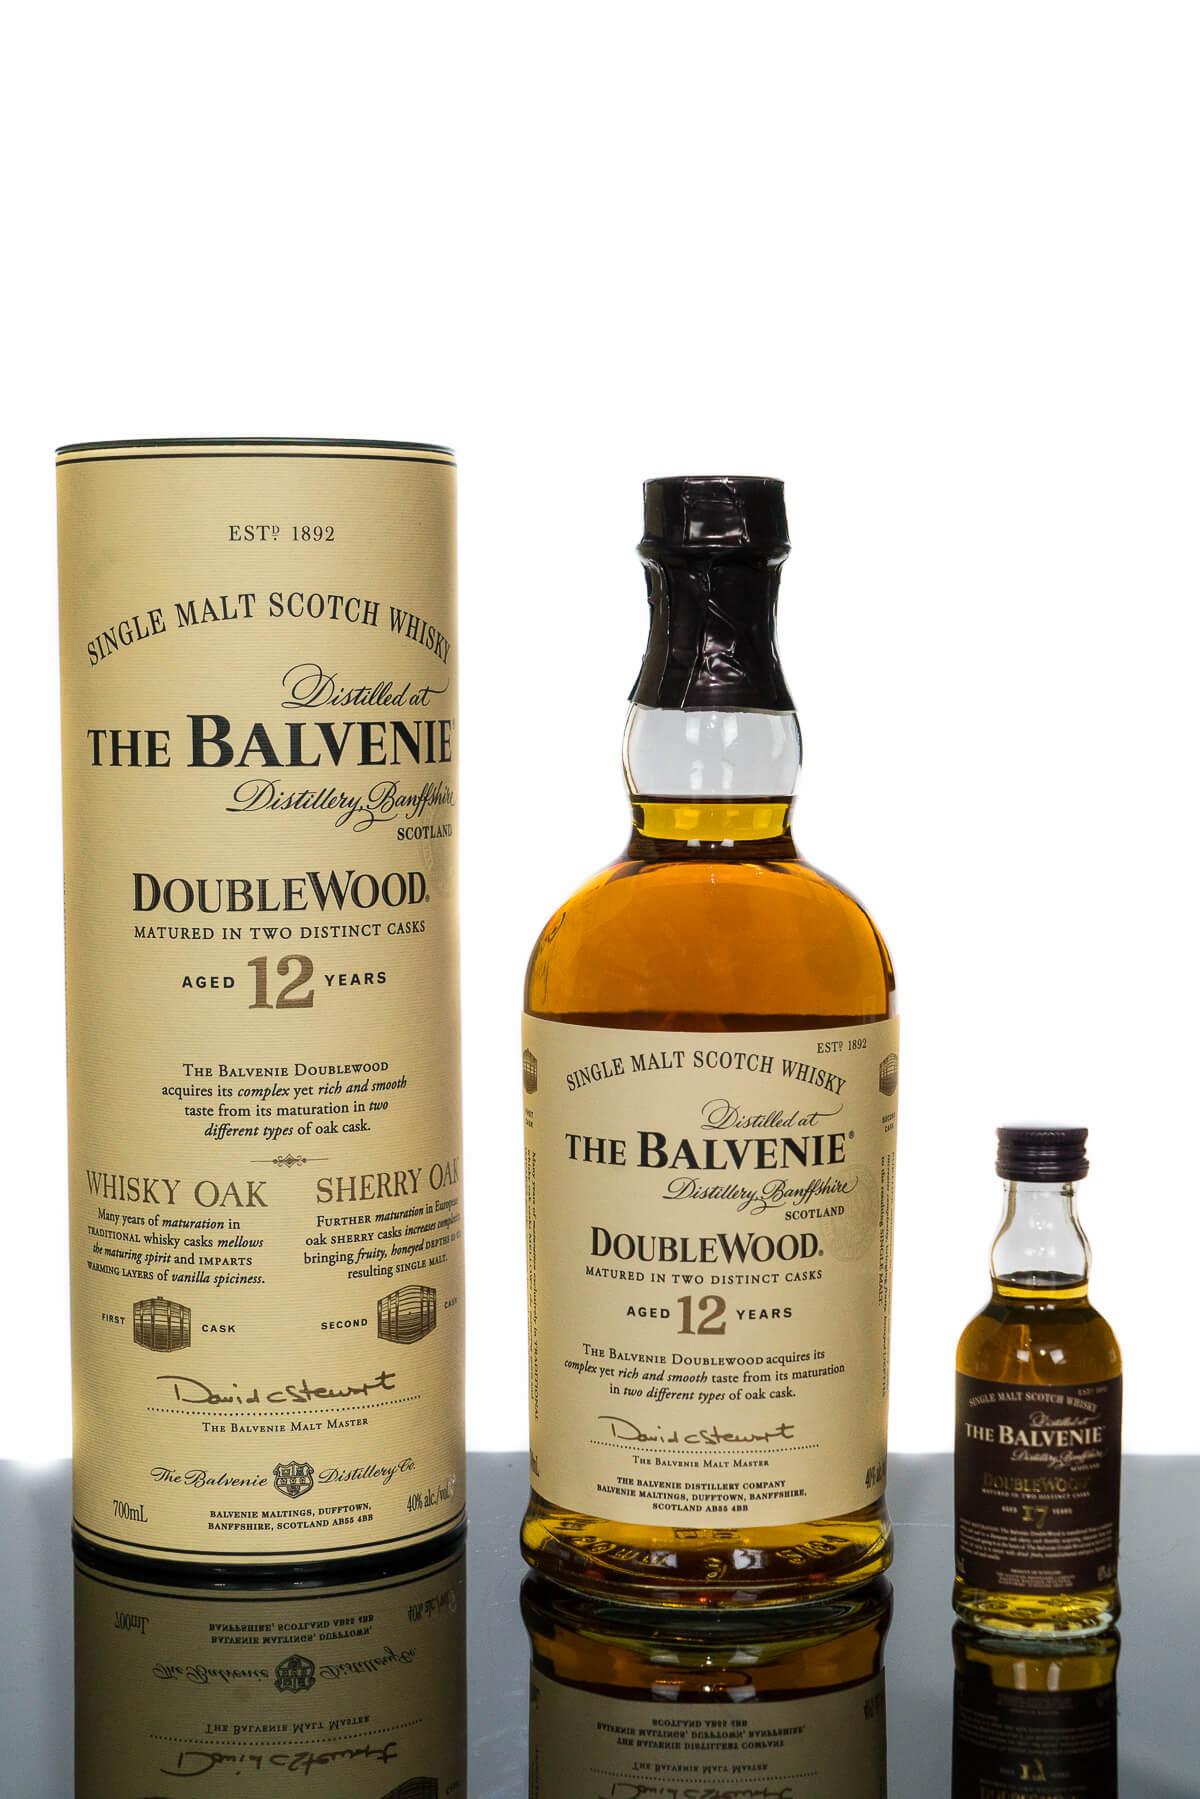 The Balvenie Aged 12 Years Doublewood Speyside Single Malt Scotch Whisky PLUS Balvenie 17YO Miniature